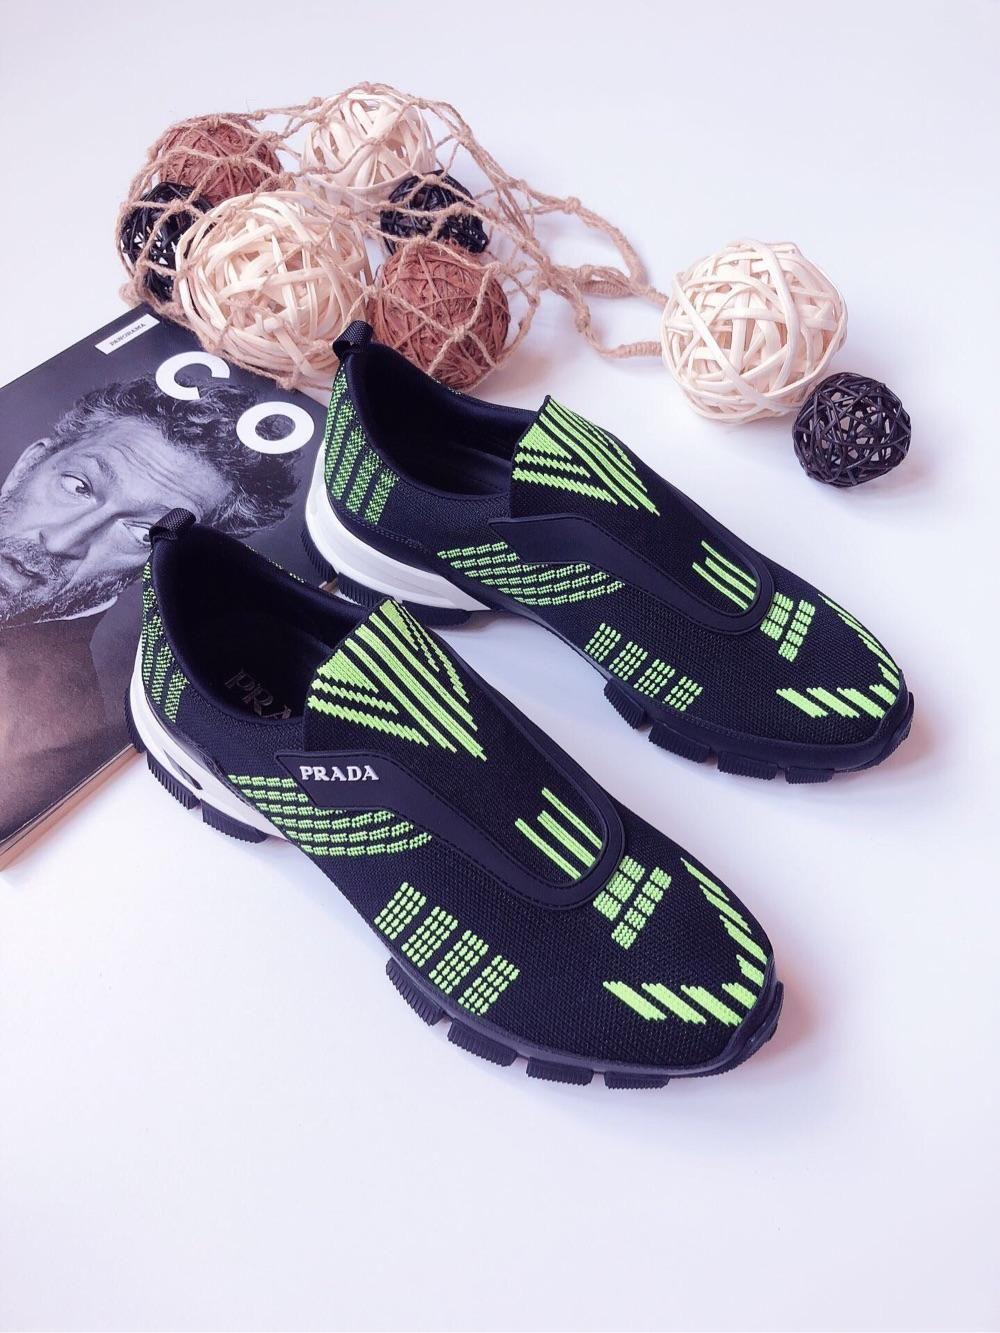 【Amily意大利】prada普拉达 男士编织运动鞋一脚蹬